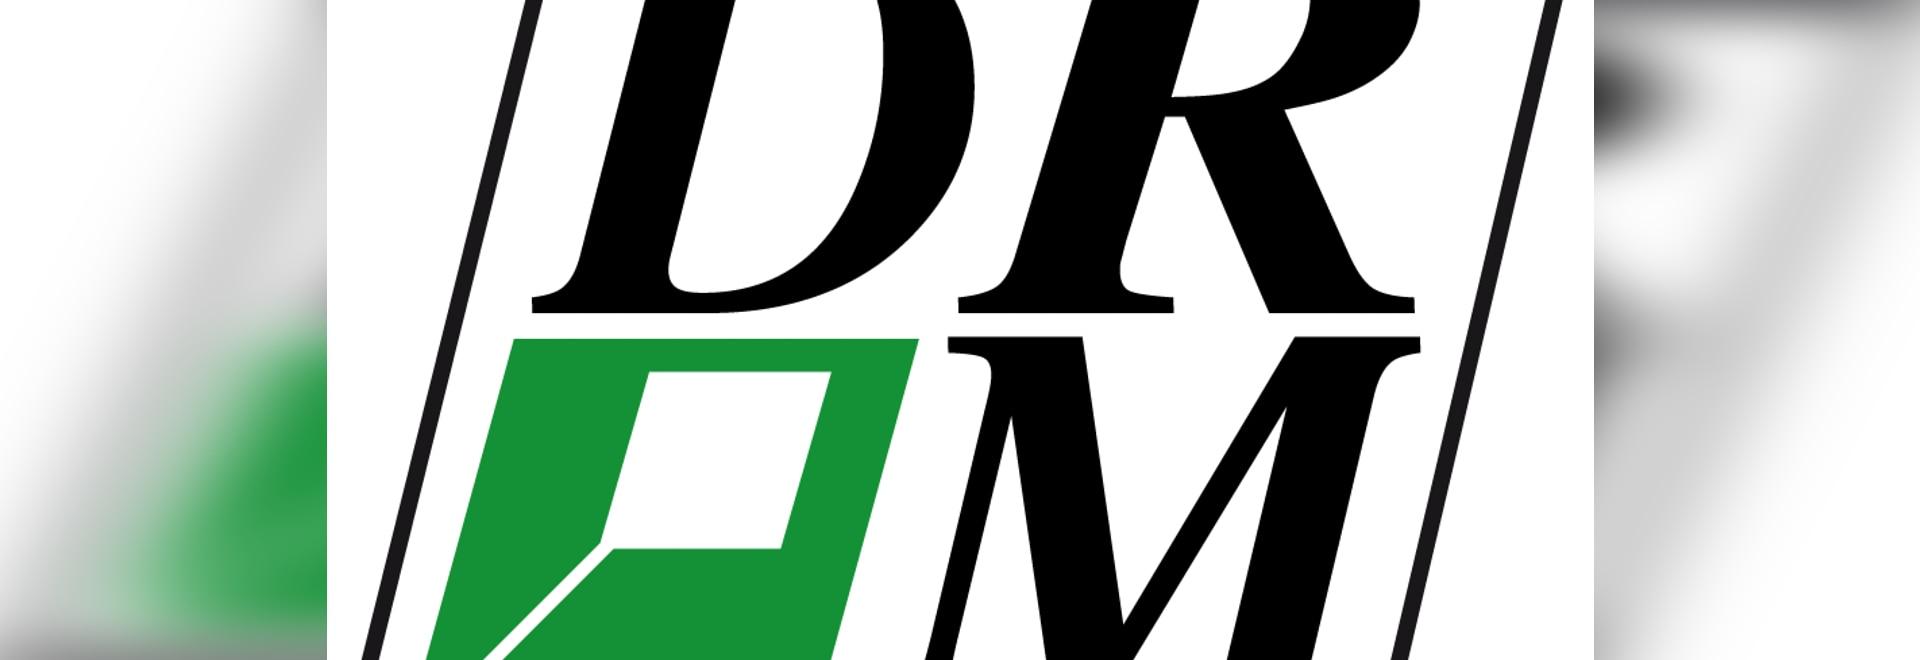 DRM SRL è regolarmente operativa nonostante l'attuale situazione globale